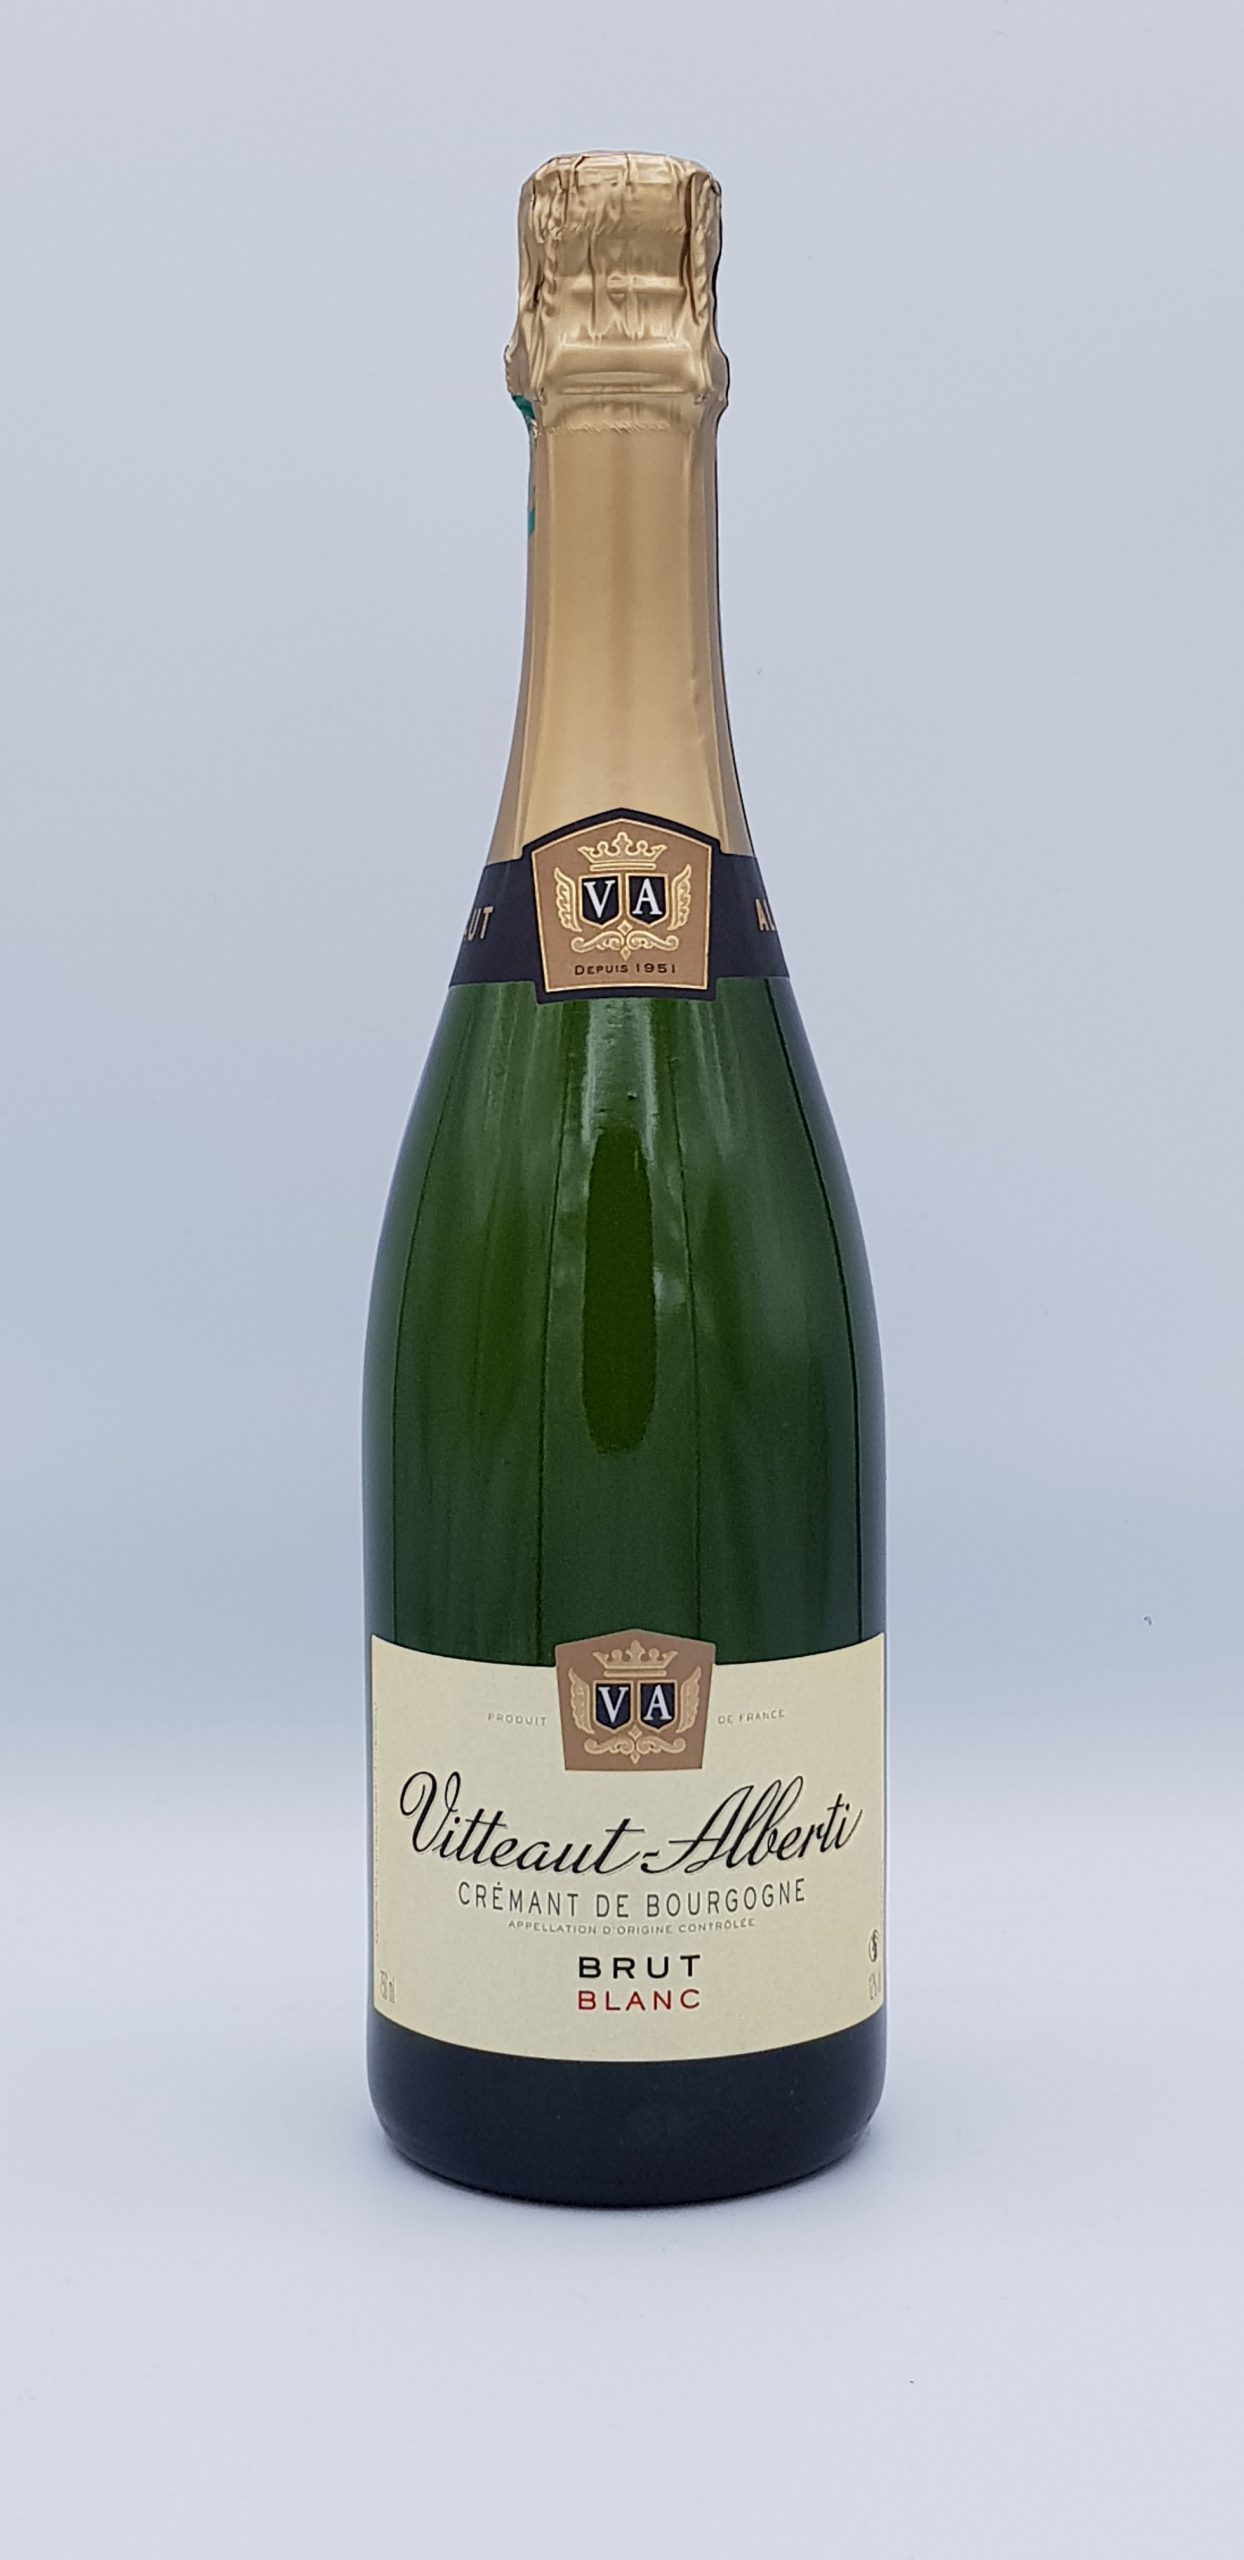 Cremant De Bourgogne Brut Blanc Vitteaut Alberti